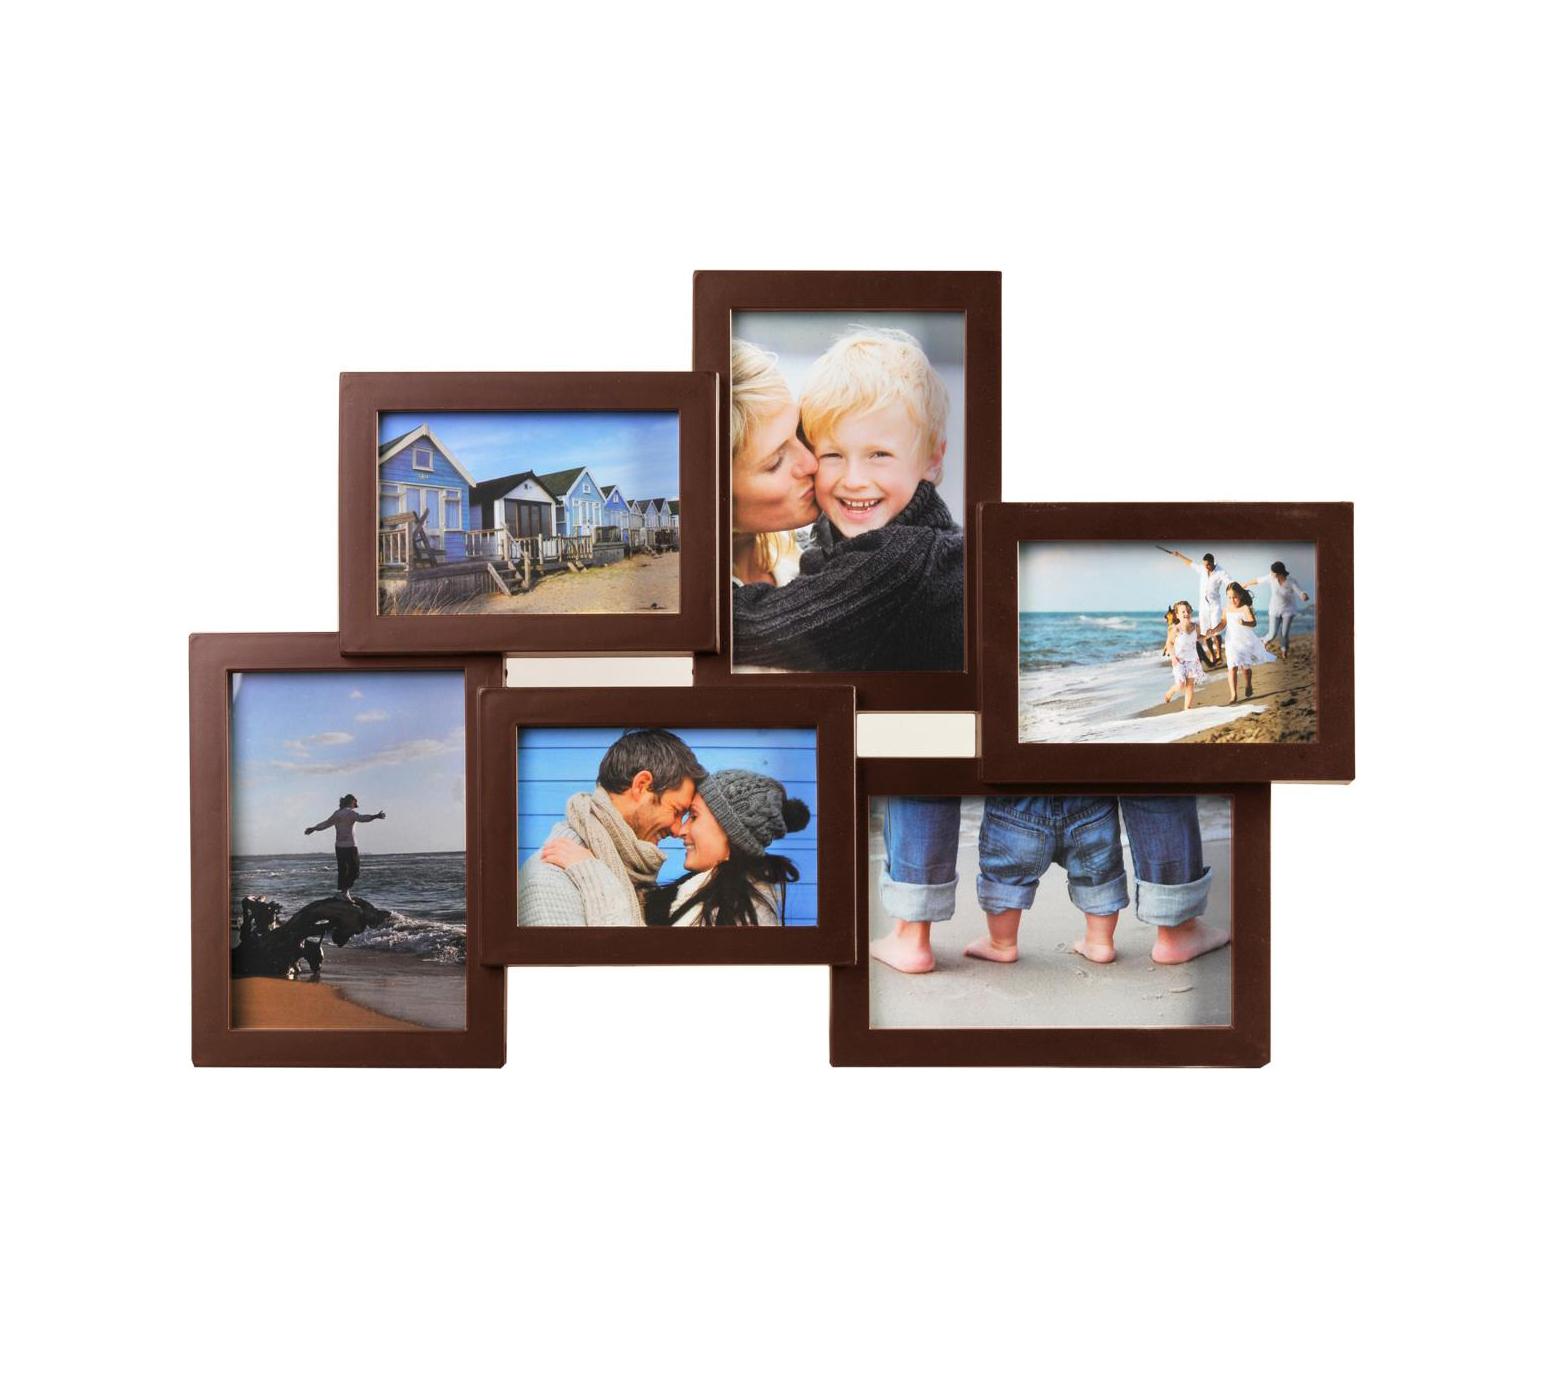 Henzo Holiday Brown Gallery 6 Photos 3x9x13 3x10x15 8121104 Κορνίζα Τοίχου